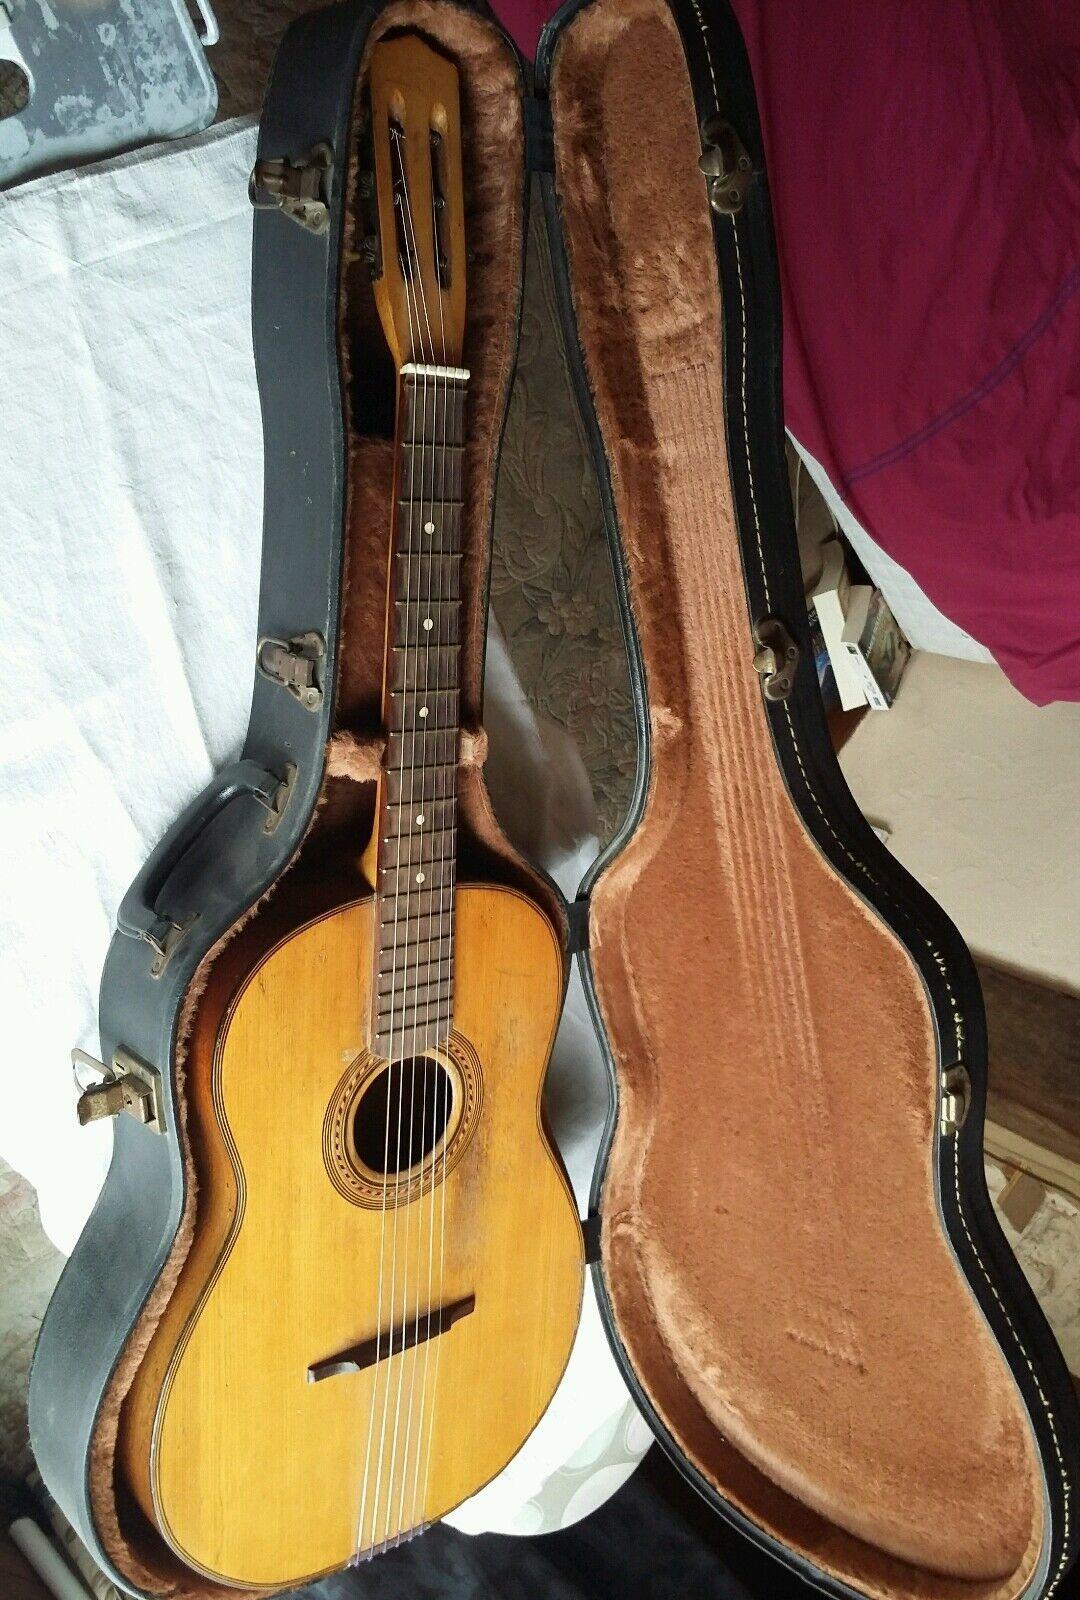 Ancienne guitare manouche old gypsy guitar luthier jazz espagnole parisienne